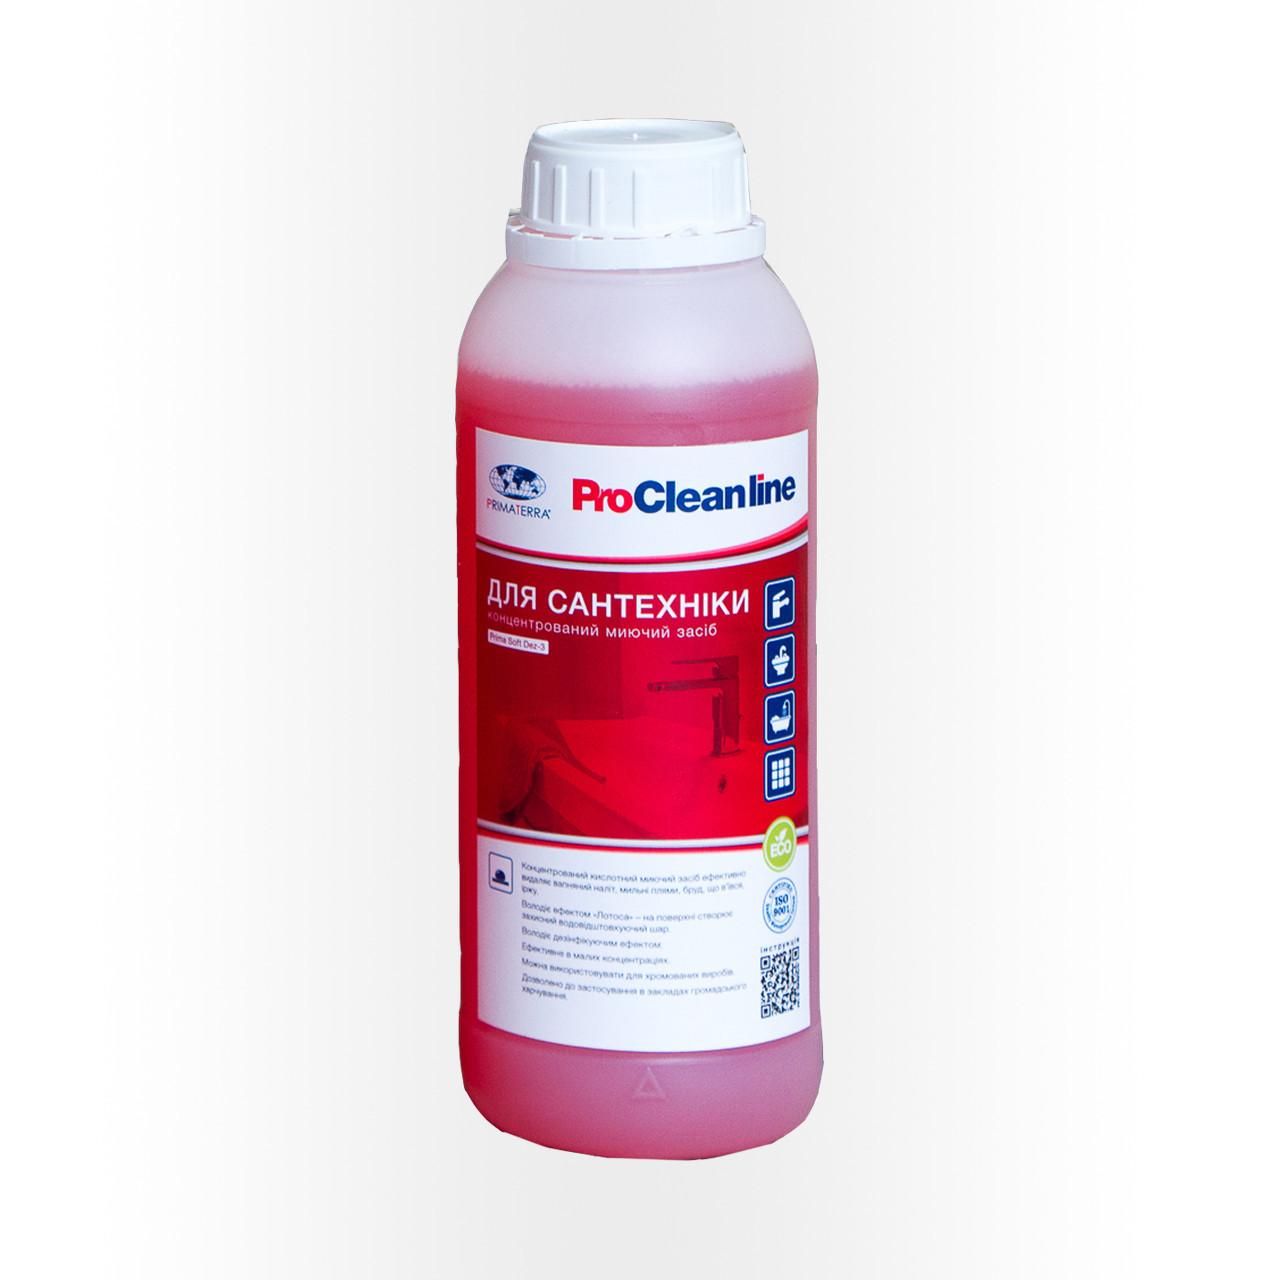 Моющее средство для сантехники Dez-3 (1,15кг)